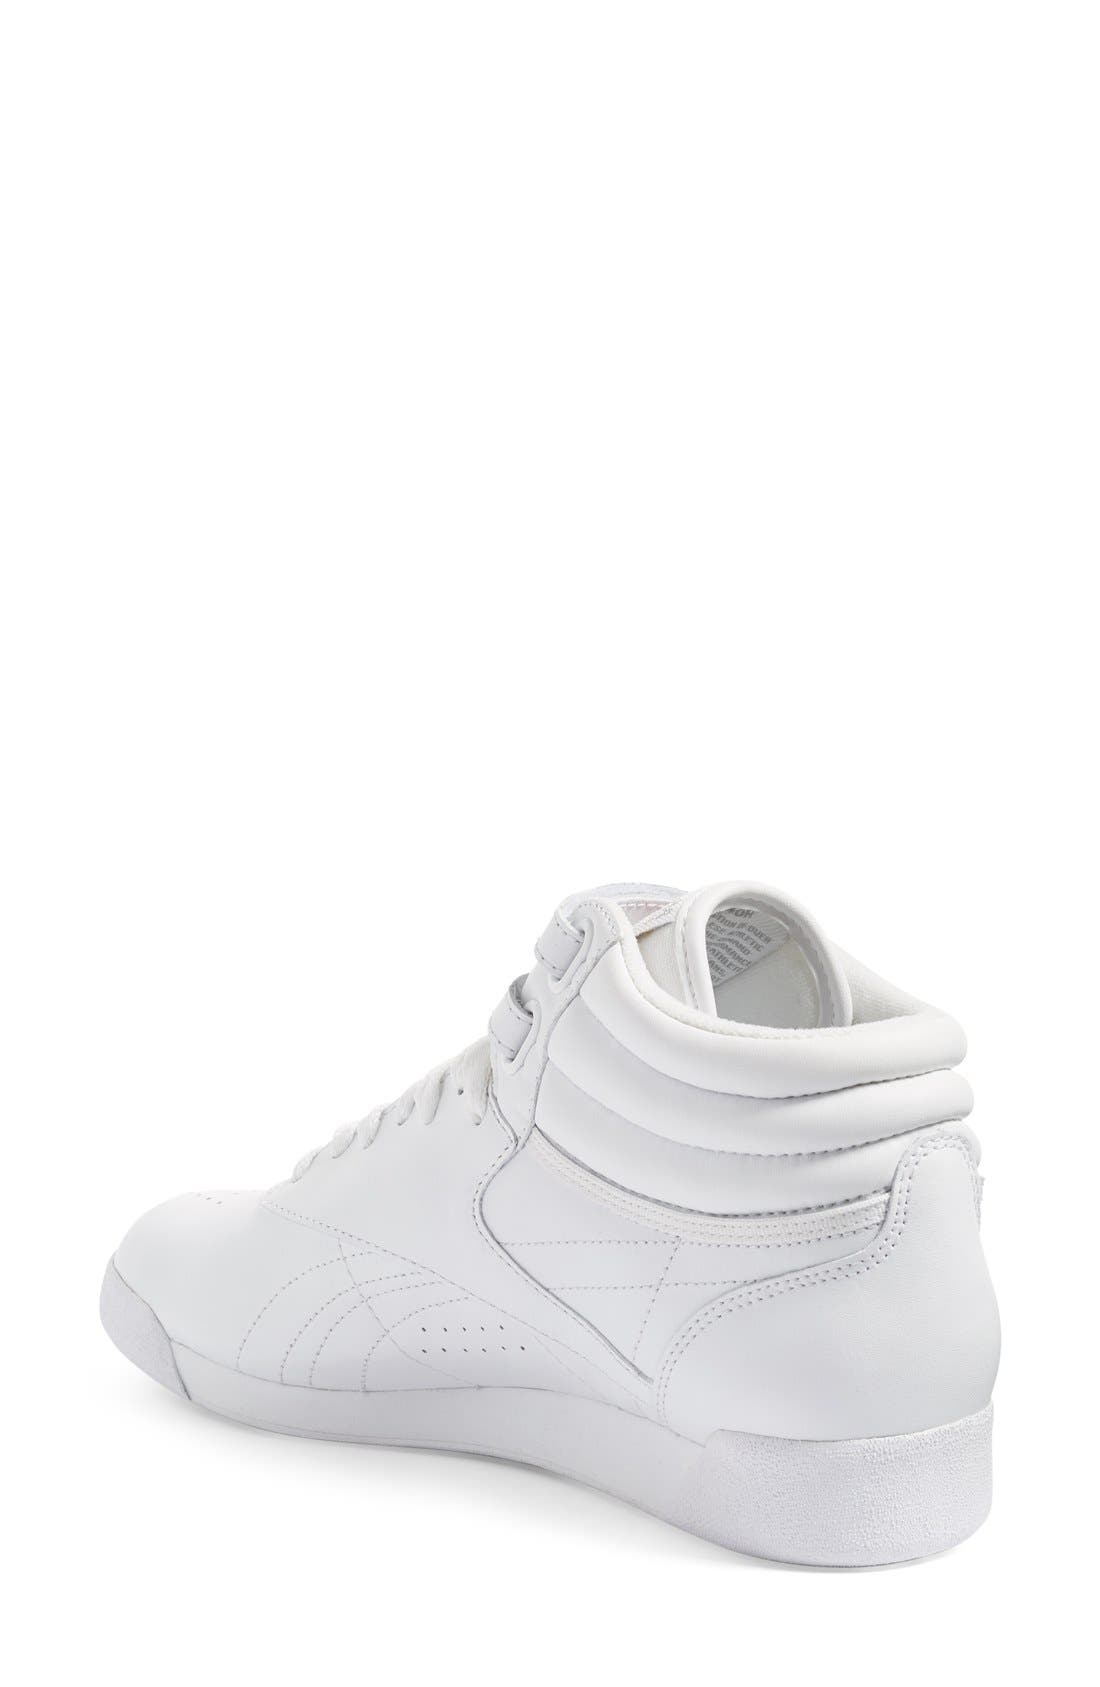 'Freestyle Hi' Sneaker,                             Alternate thumbnail 2, color,                             White/ Silver